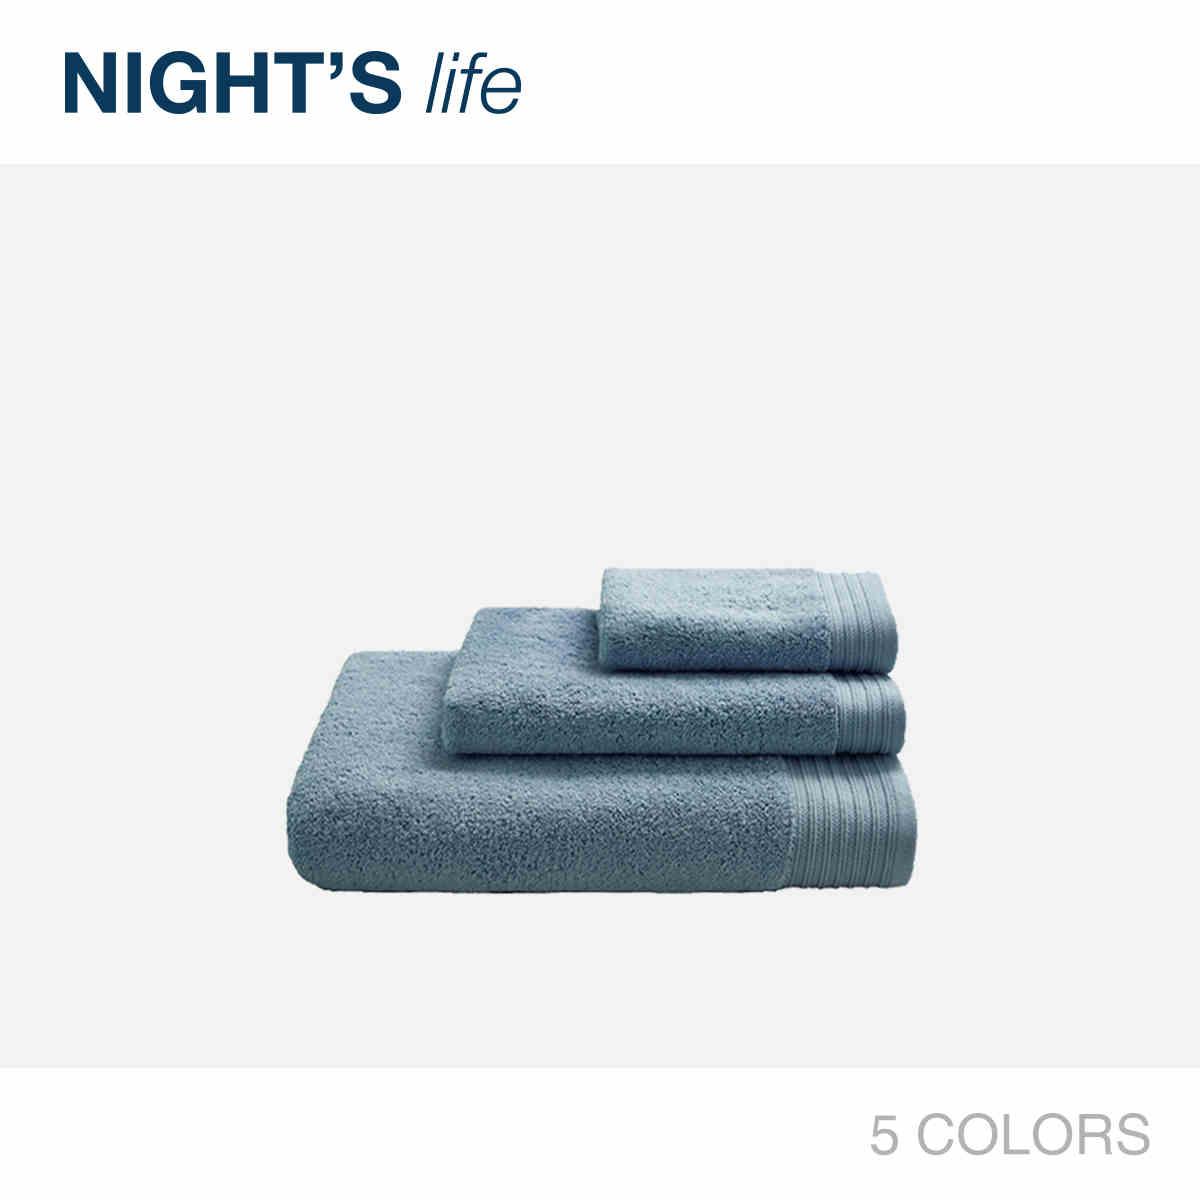 NIGHT'S夜家居海棉优选家纺毛巾三件套浴巾套装方巾3件套柔软套件